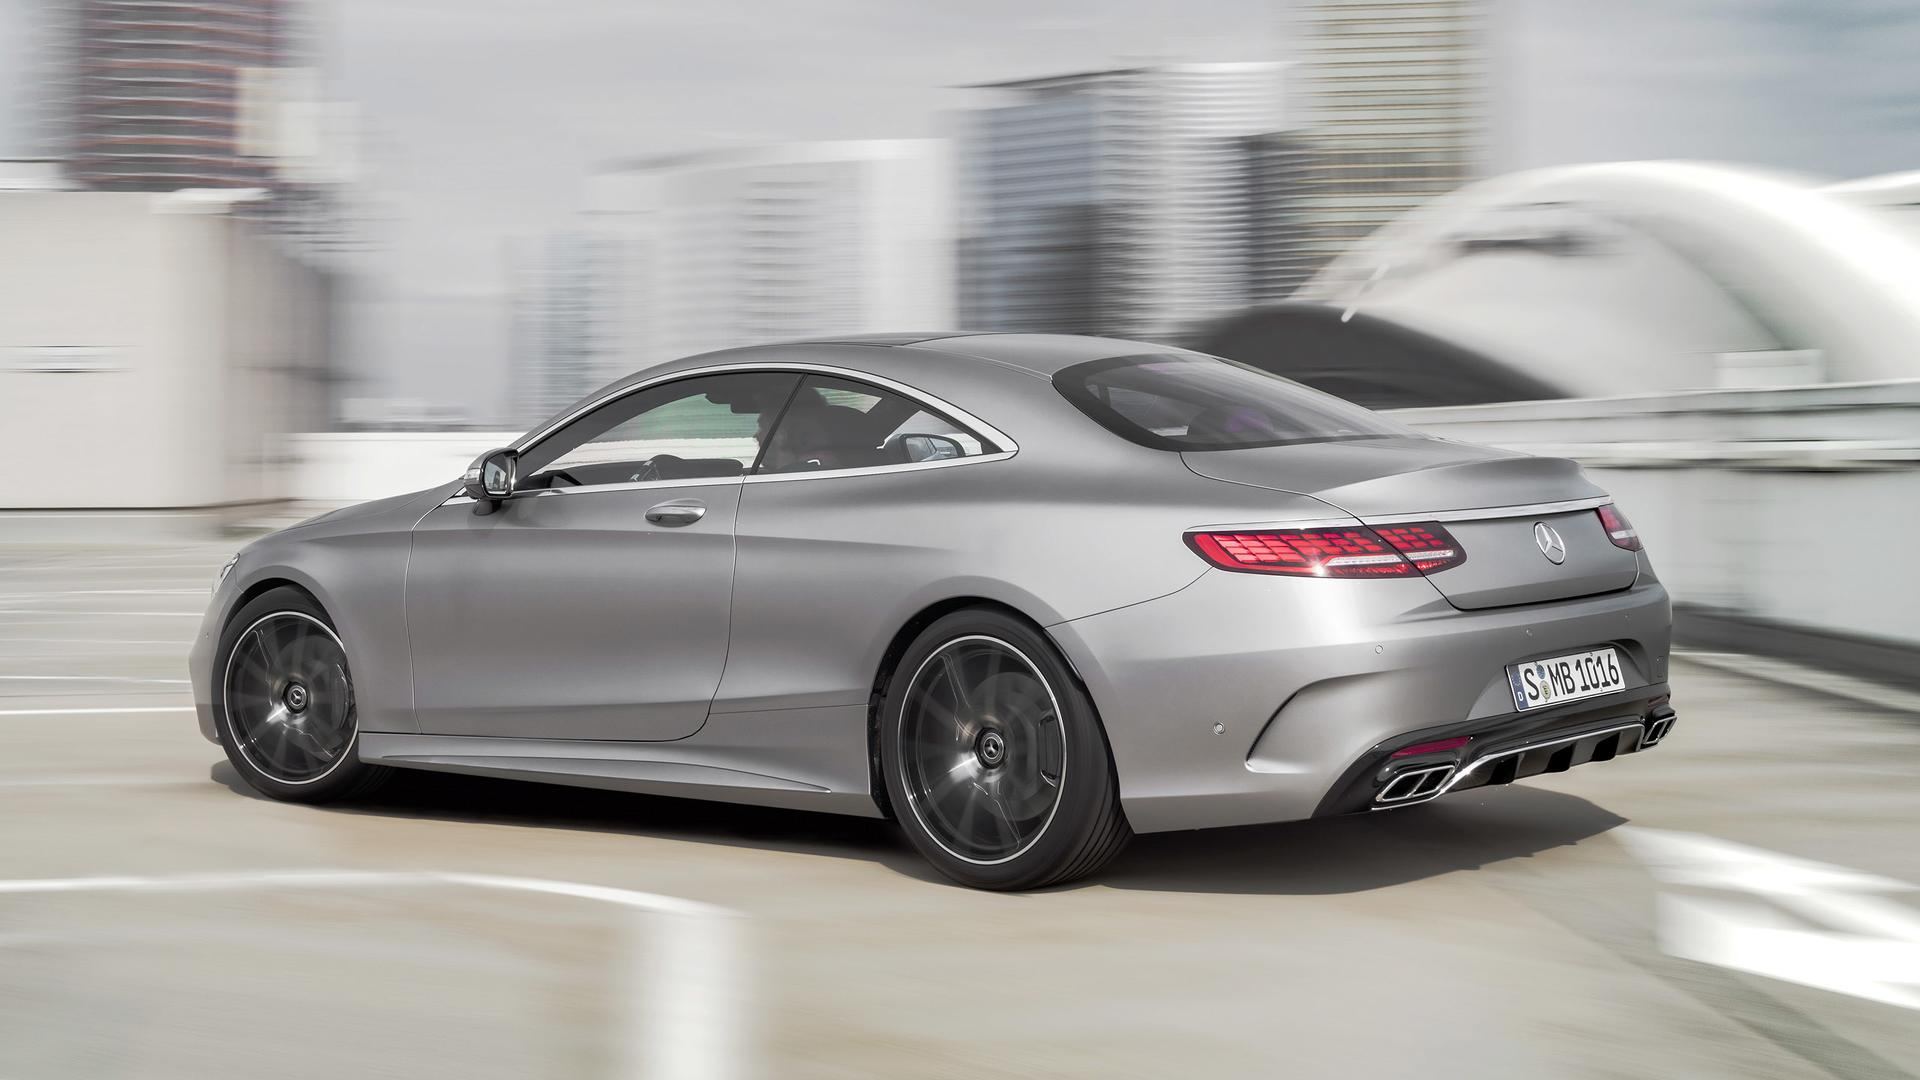 https://icdn-1.motor1.com/images/mgl/PjWWK/s1/2018-mercedes-benz-s-class-coupe.jpg